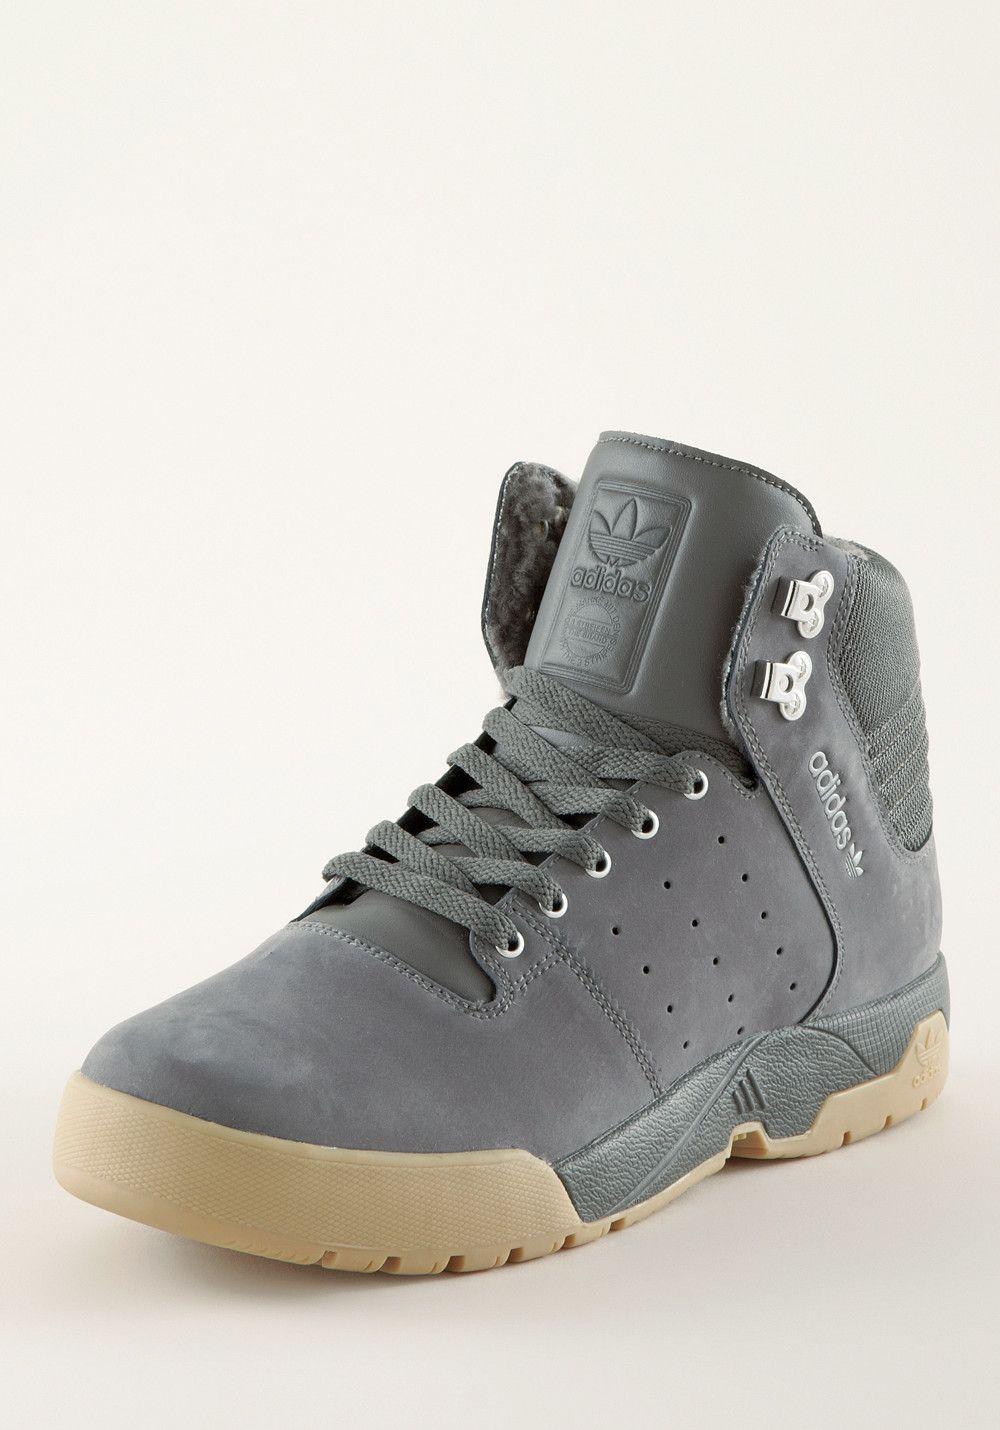 c0ddc7c9aa6485 ADIDAS Uptown TD Winter Nubuck Mesh Adidas Originals